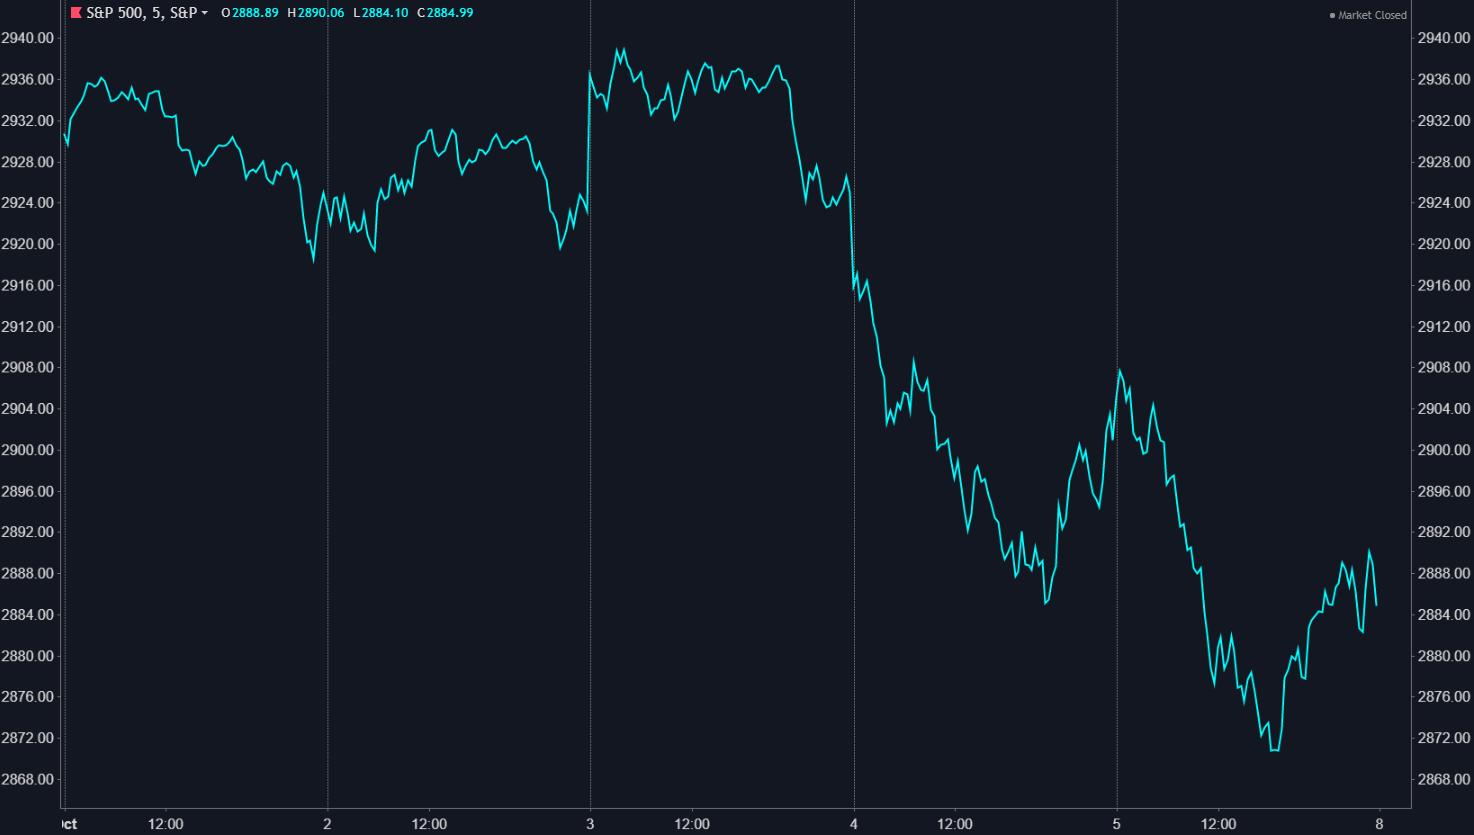 US-Indizes-die-Zinsangst-geht-um-Chartanalyse-Simon-Hauser-GodmodeTrader.de-1